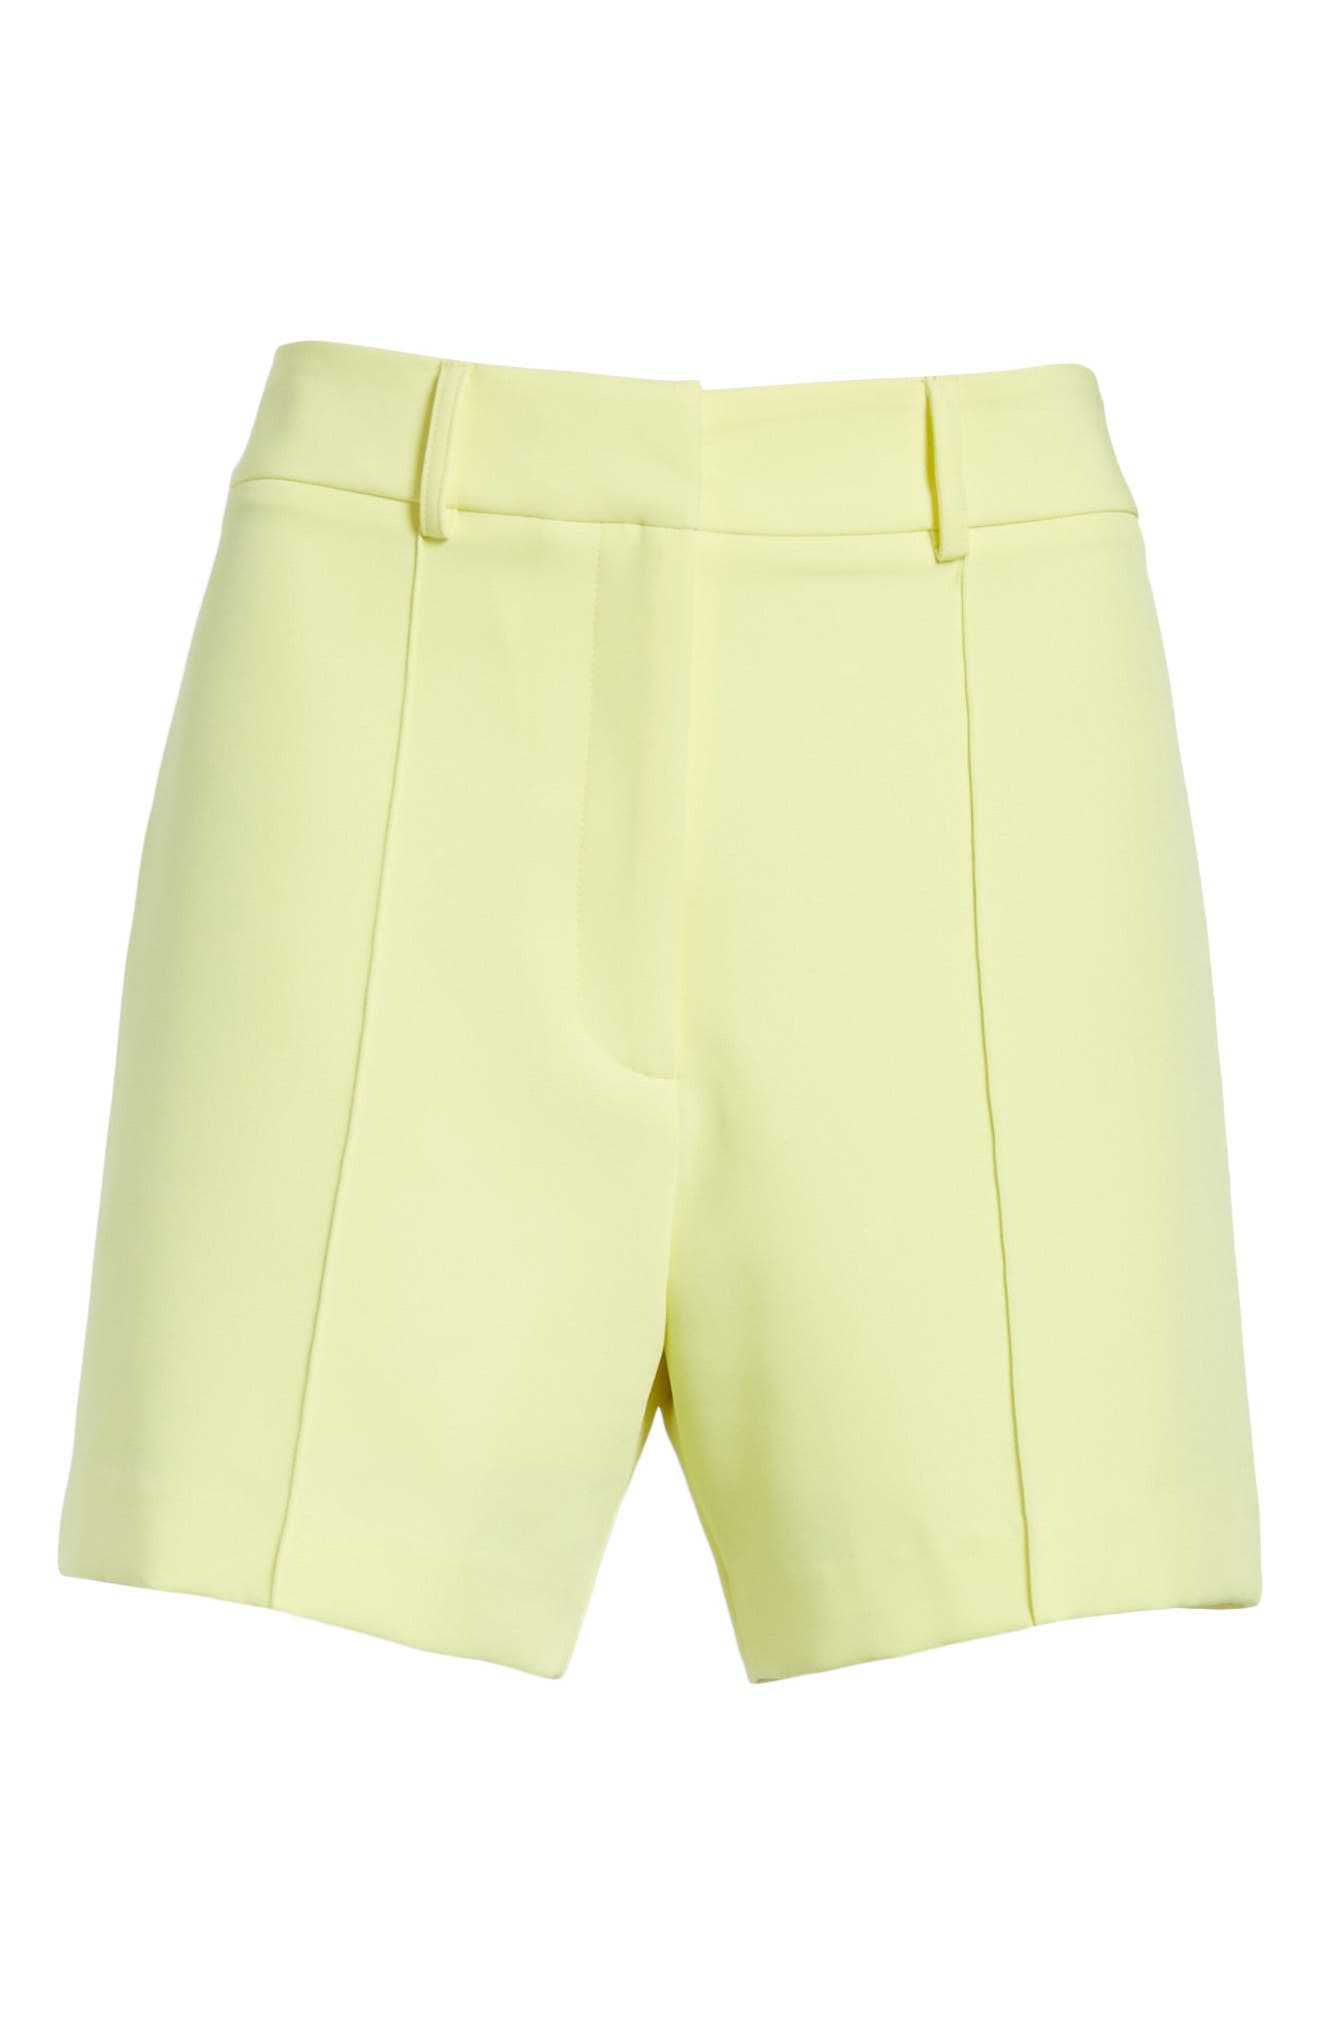 Hayden Trouser Shorts,                             Alternate thumbnail 6, color,                             Lemon Yellow